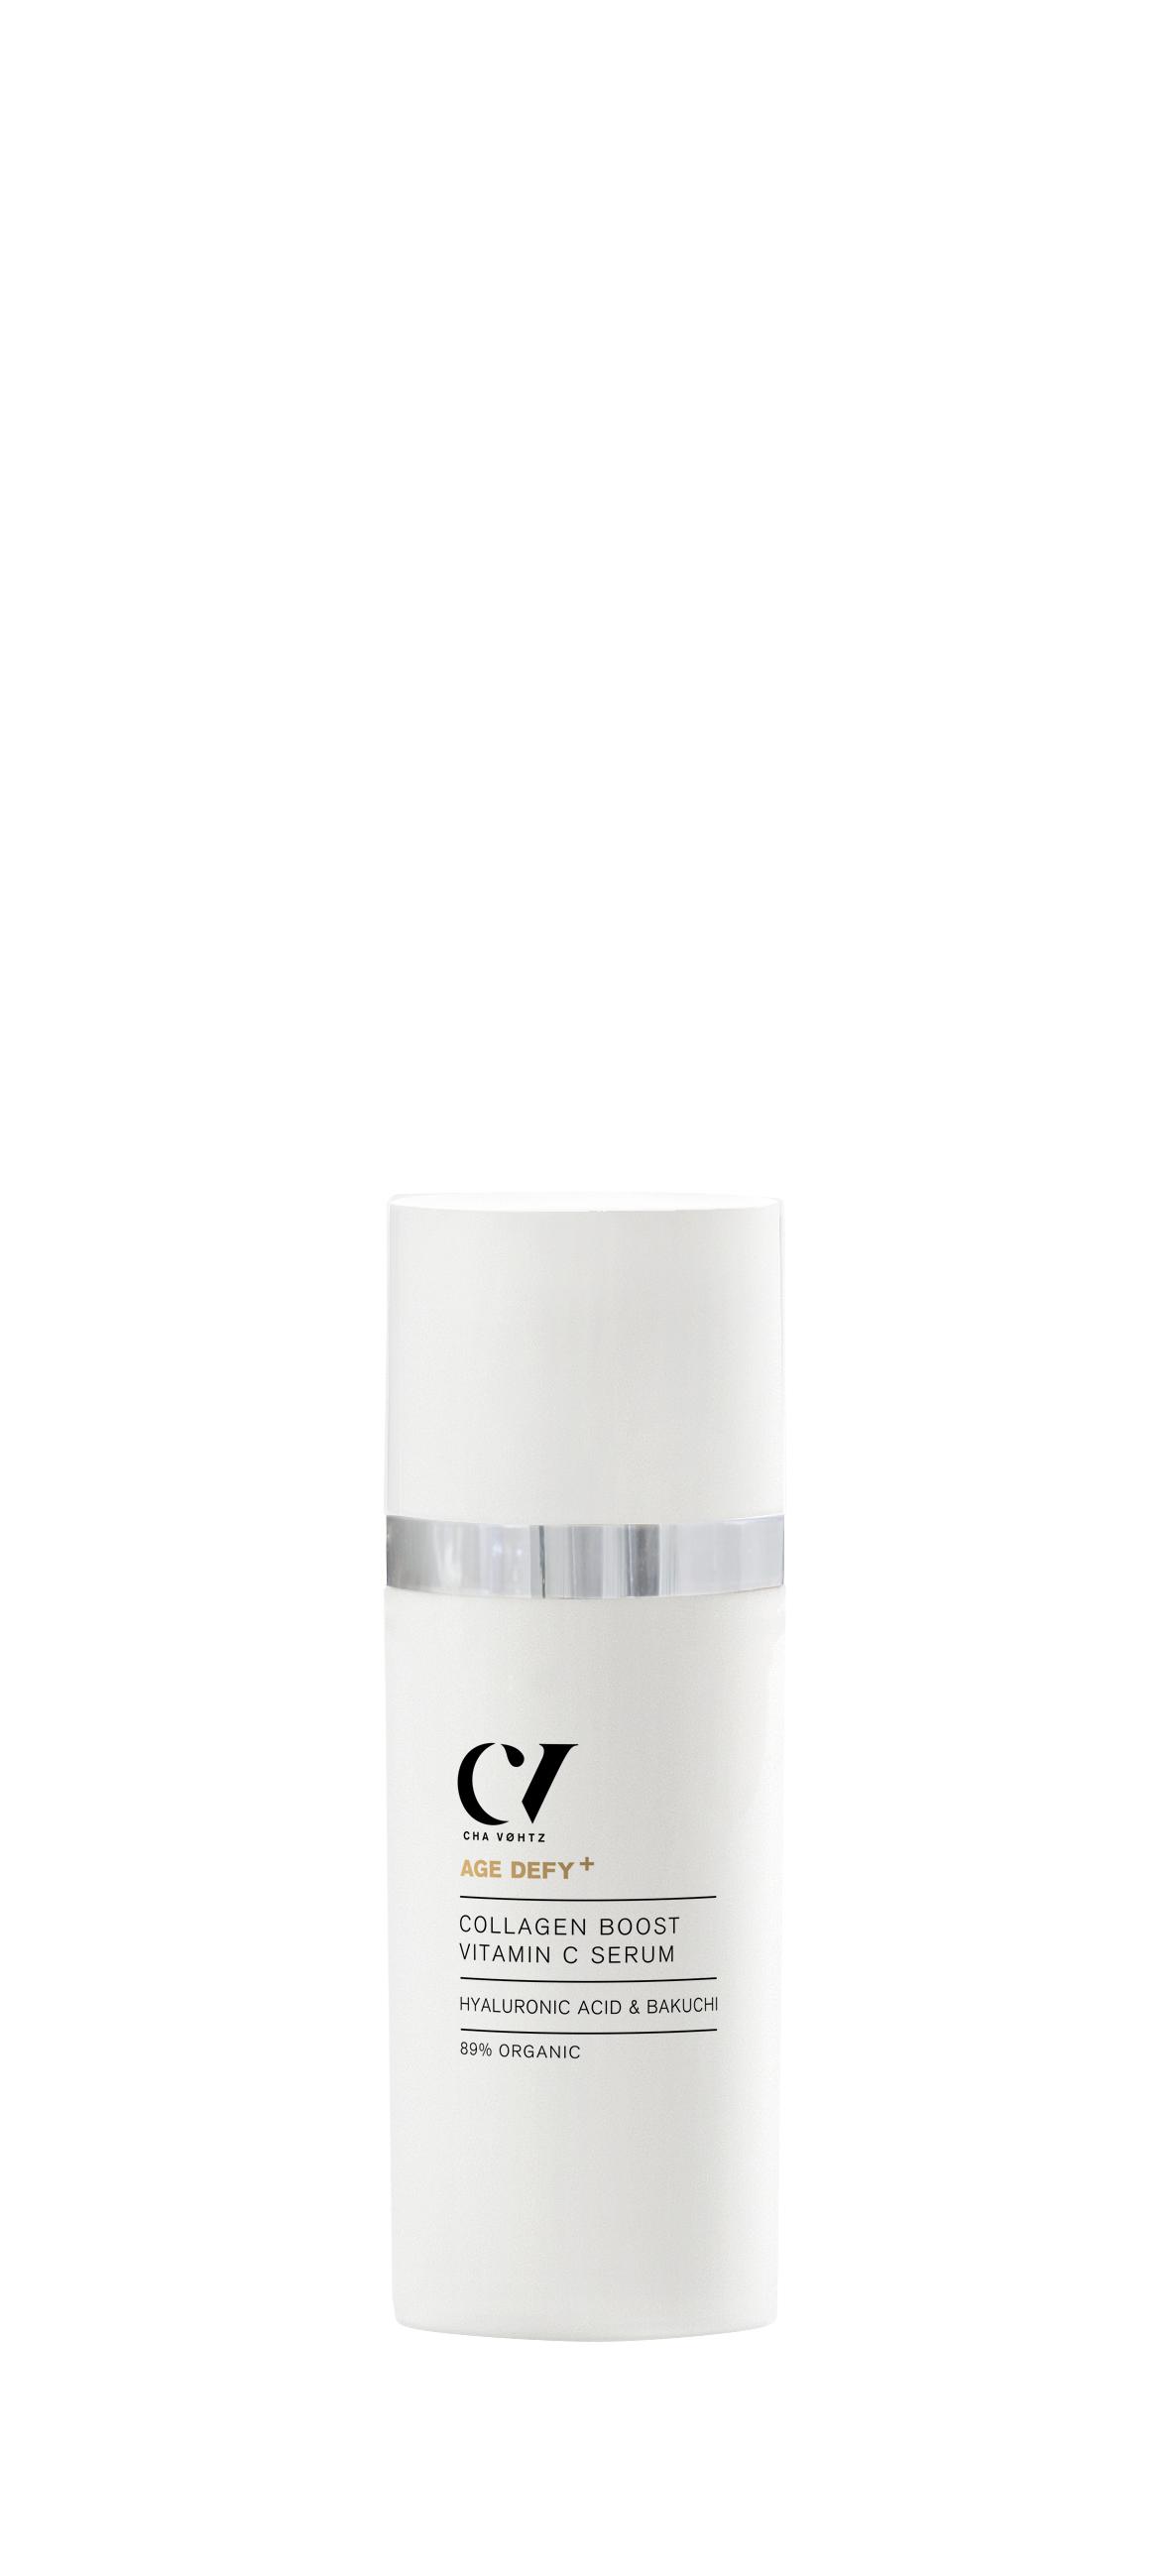 Age Defy+ Collagen Boost Vitamin C 30ml